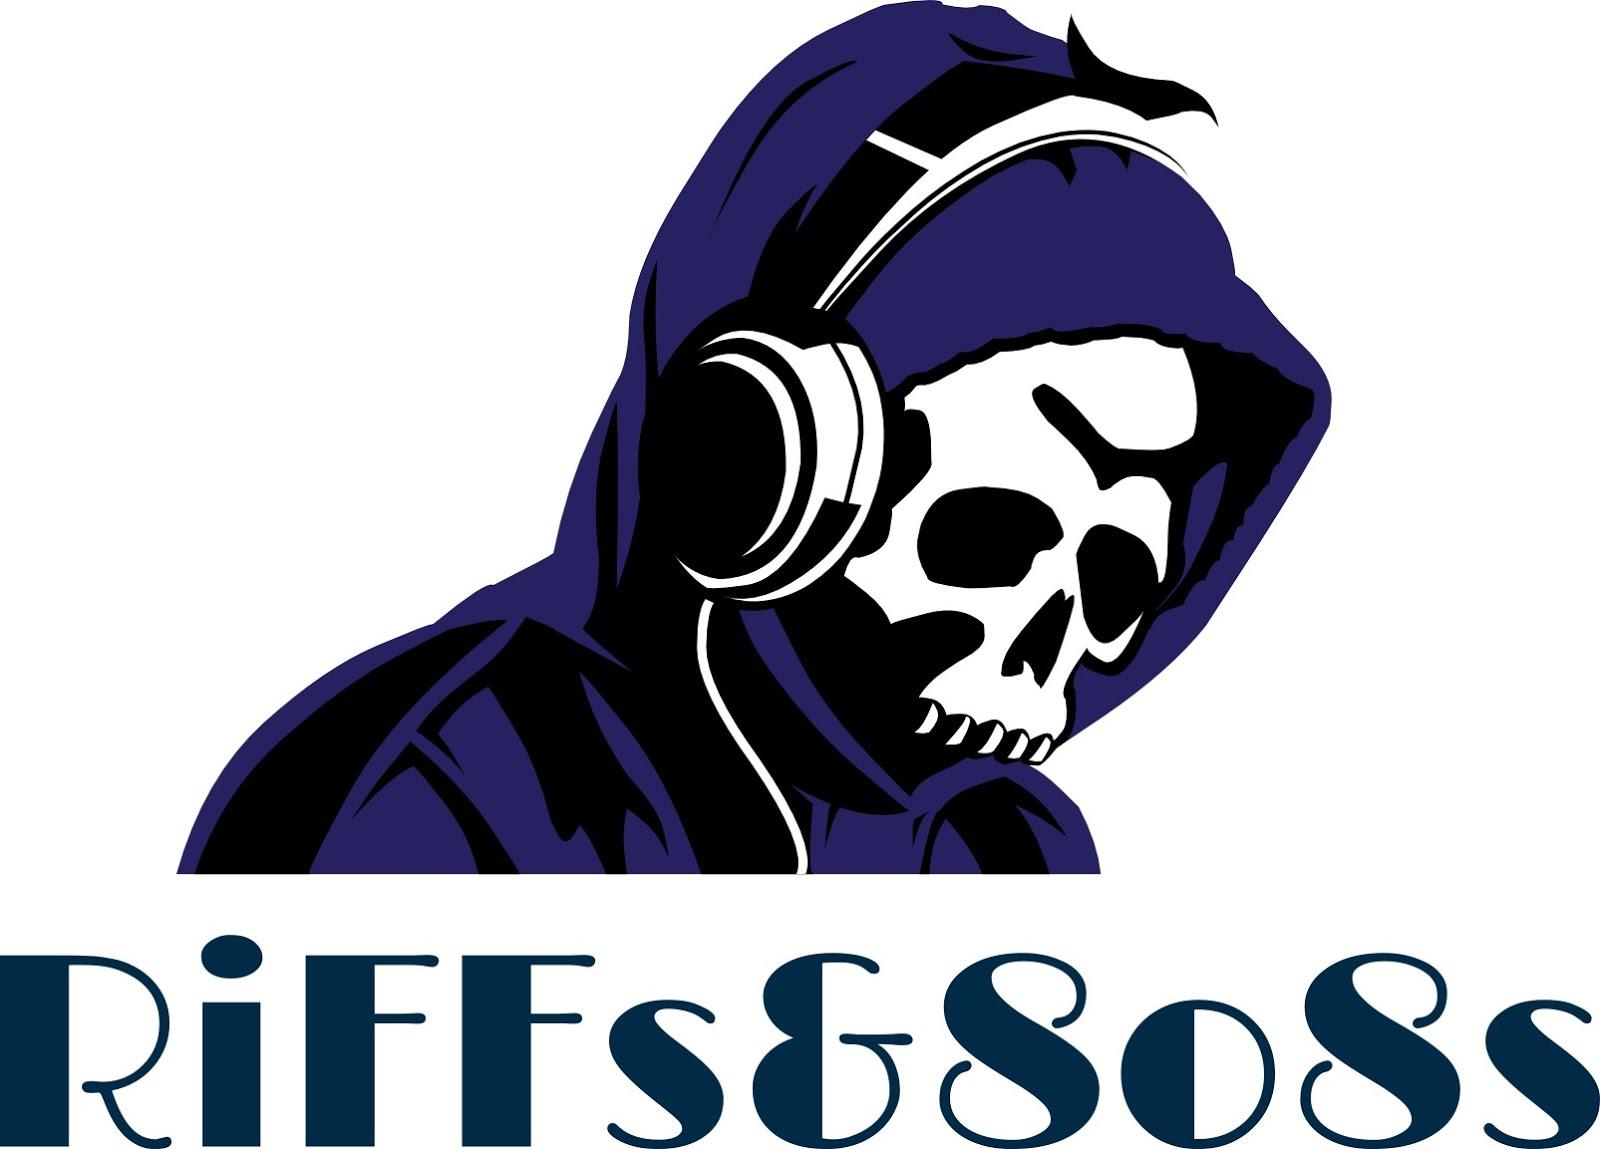 RIFFS&8O8s